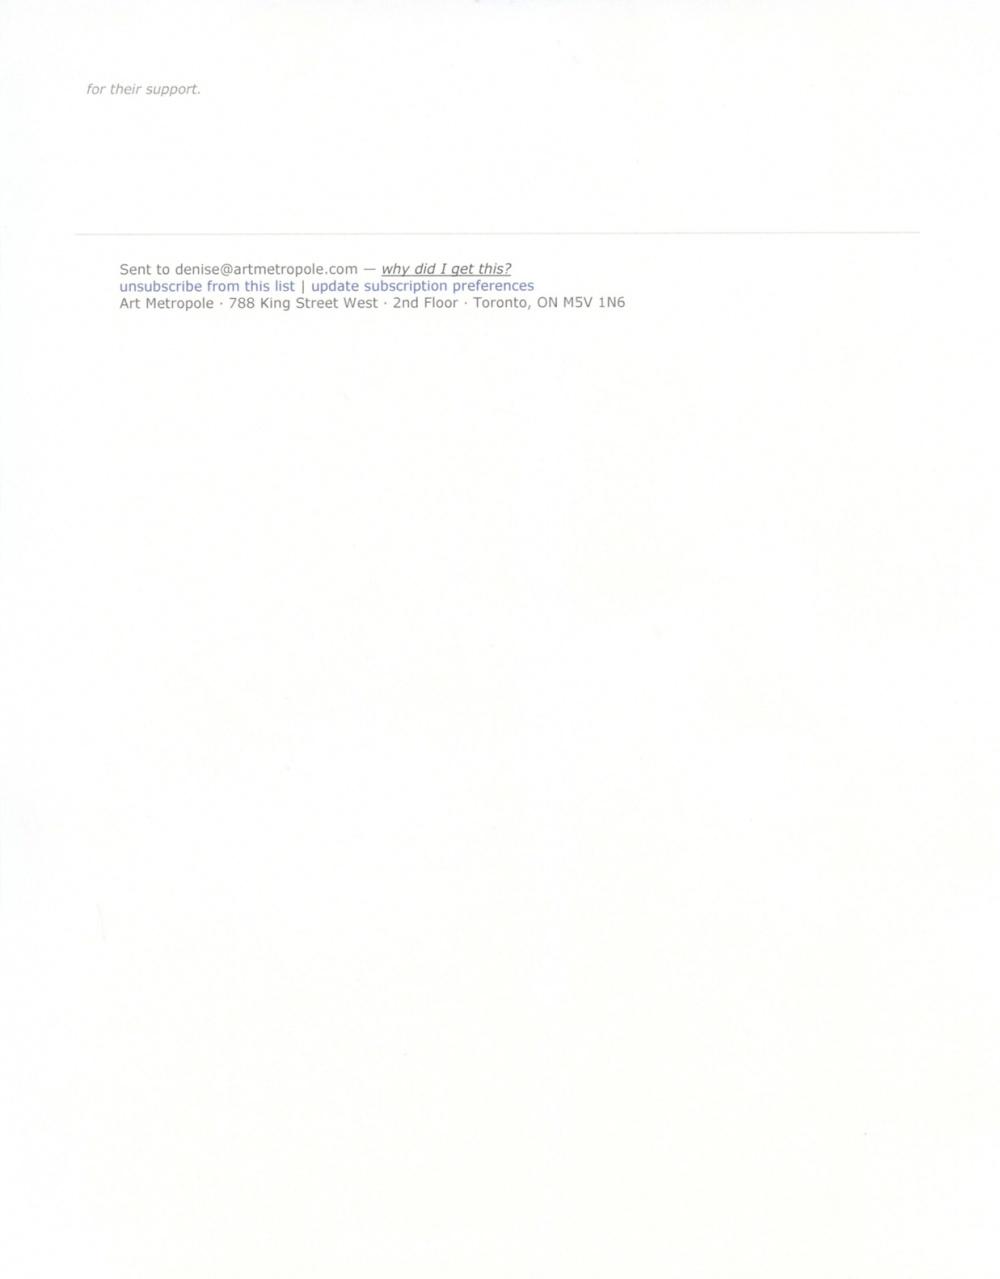 AMA1204, page 3